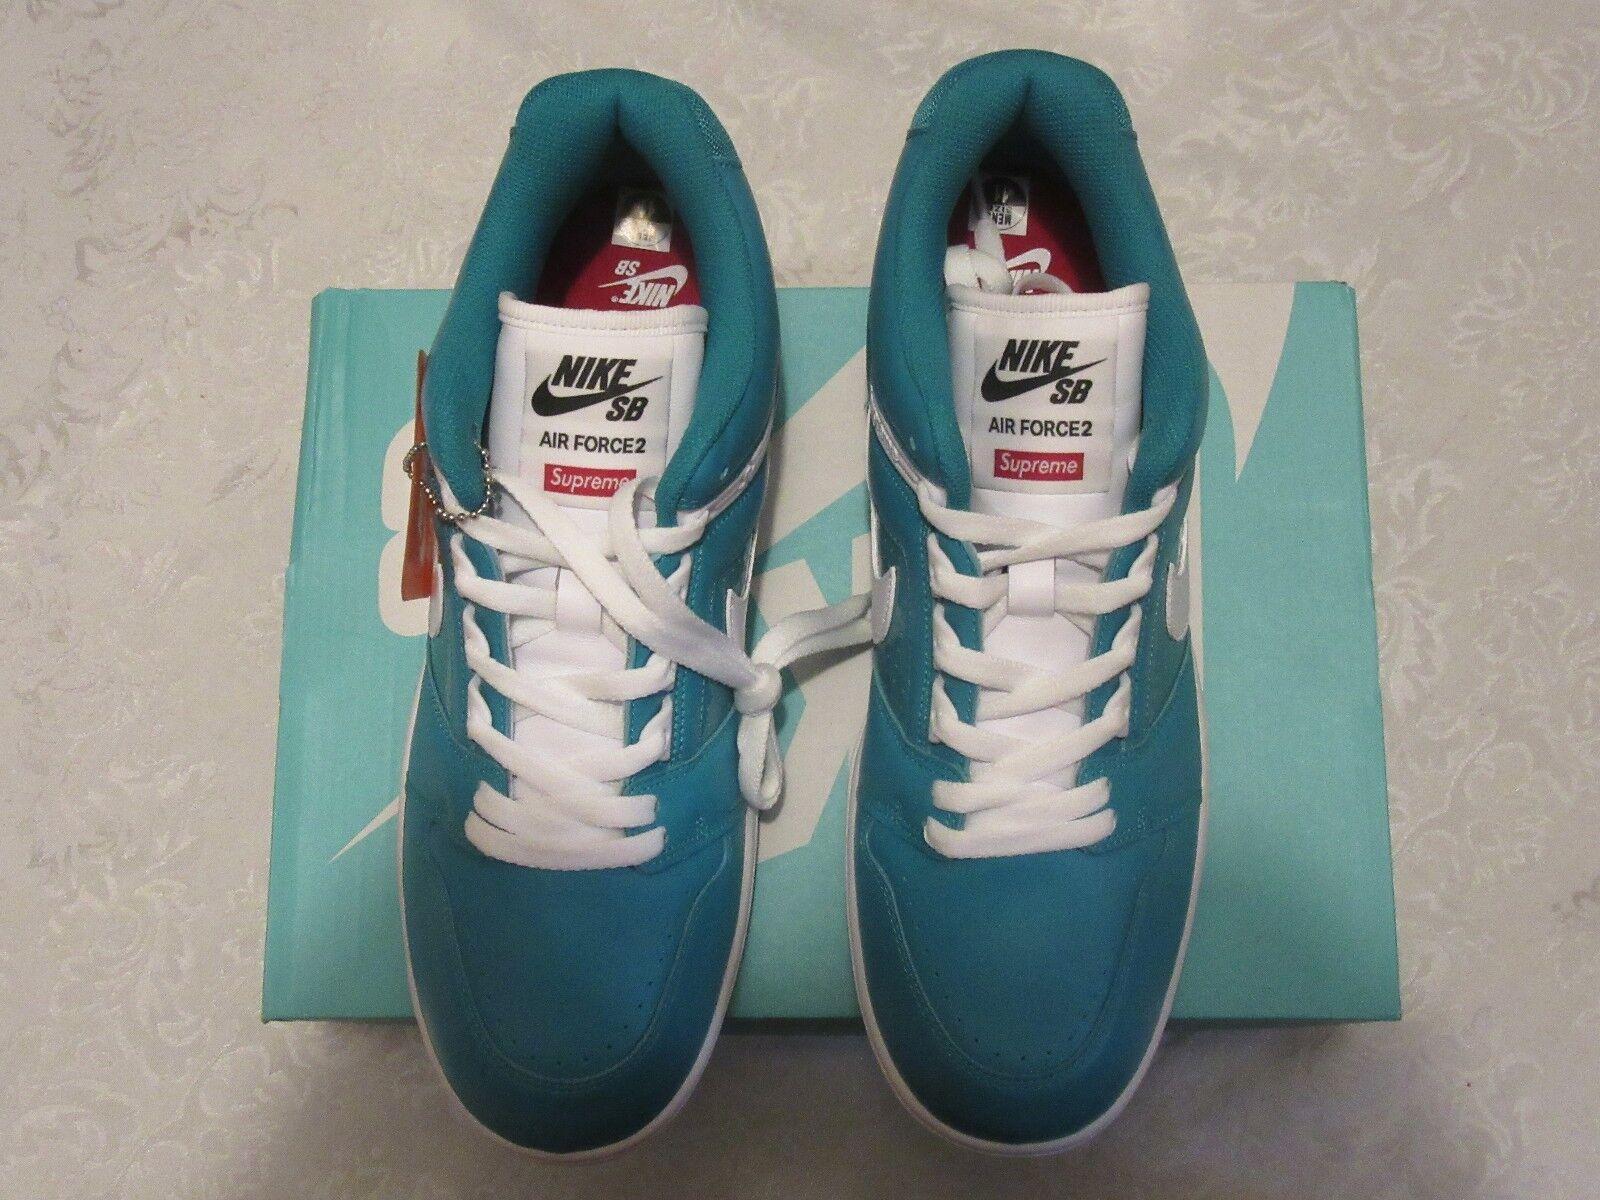 Nike AF2 Supreme SB Low Emerald Blue World Famous Air Force 2 AA0871 313 Sz 11